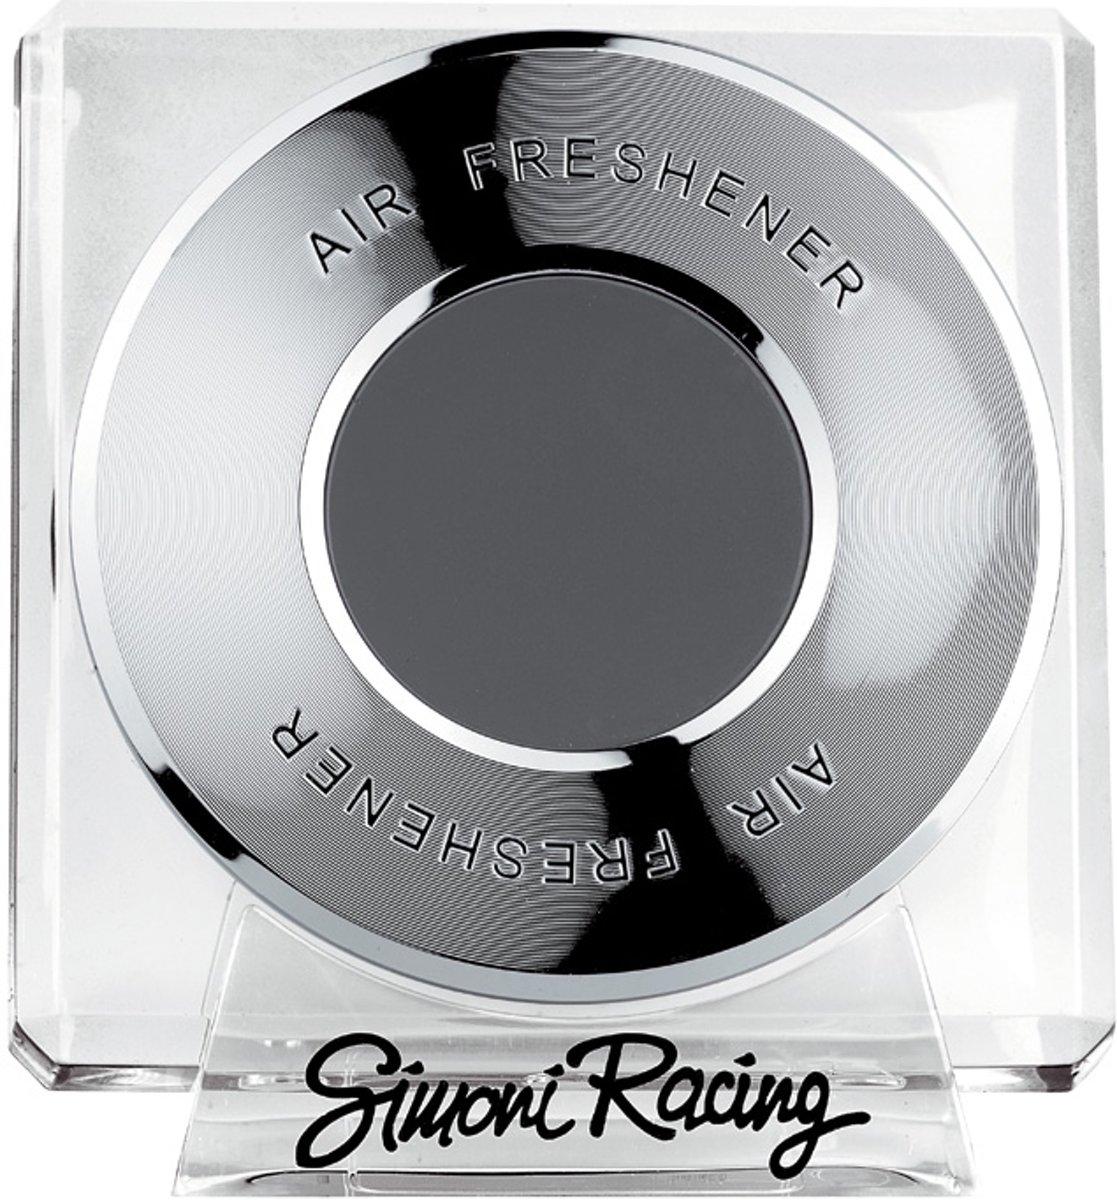 Simoni Racing Luchtverfrisser Crystal - BLV Black kopen